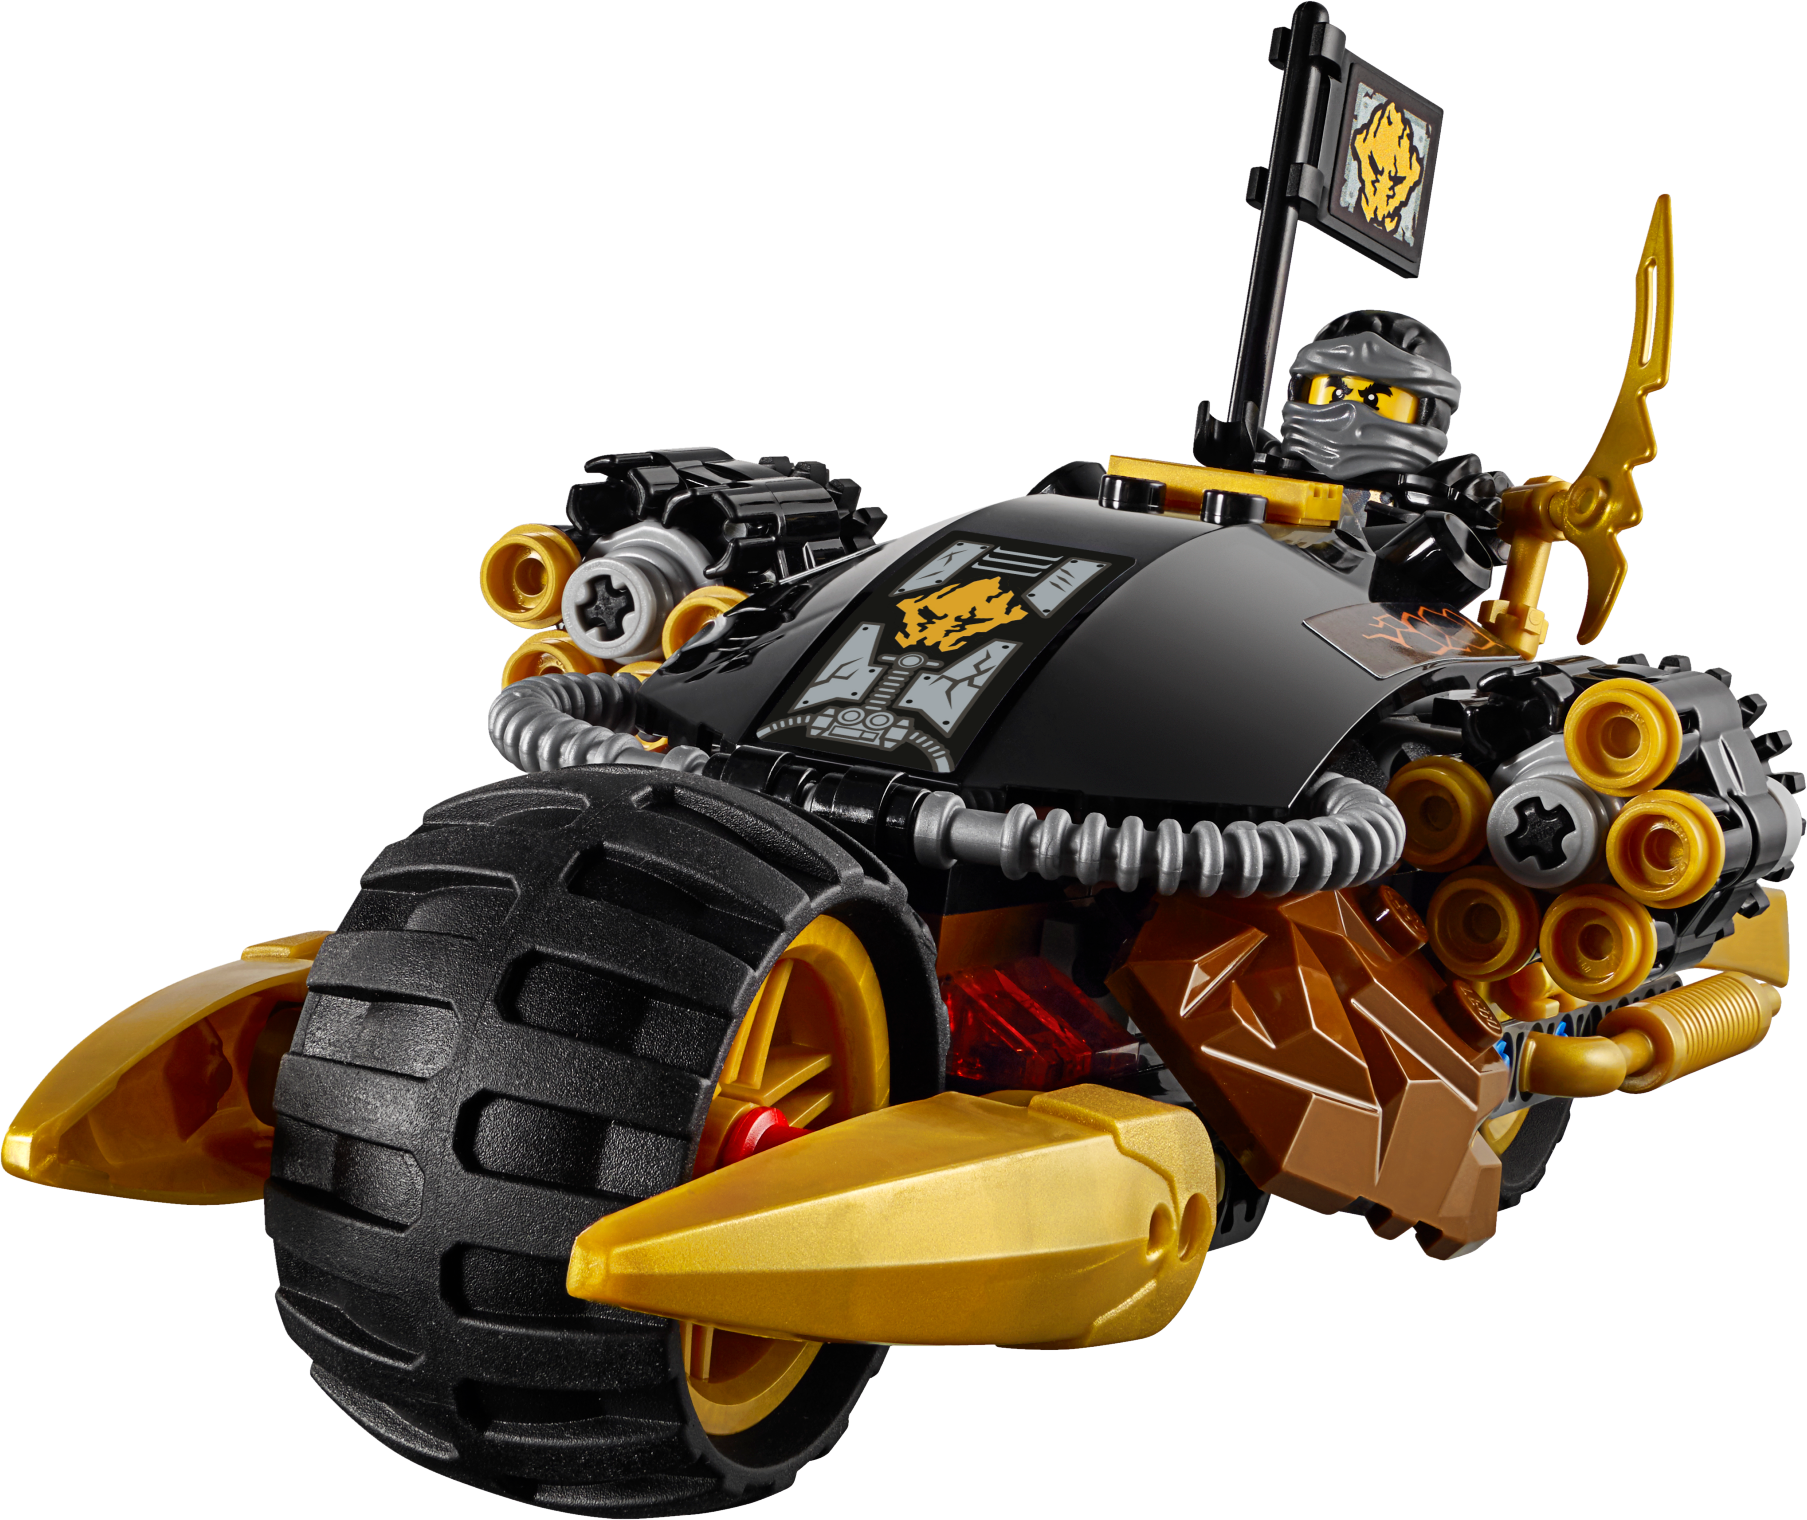 Blaster Bike